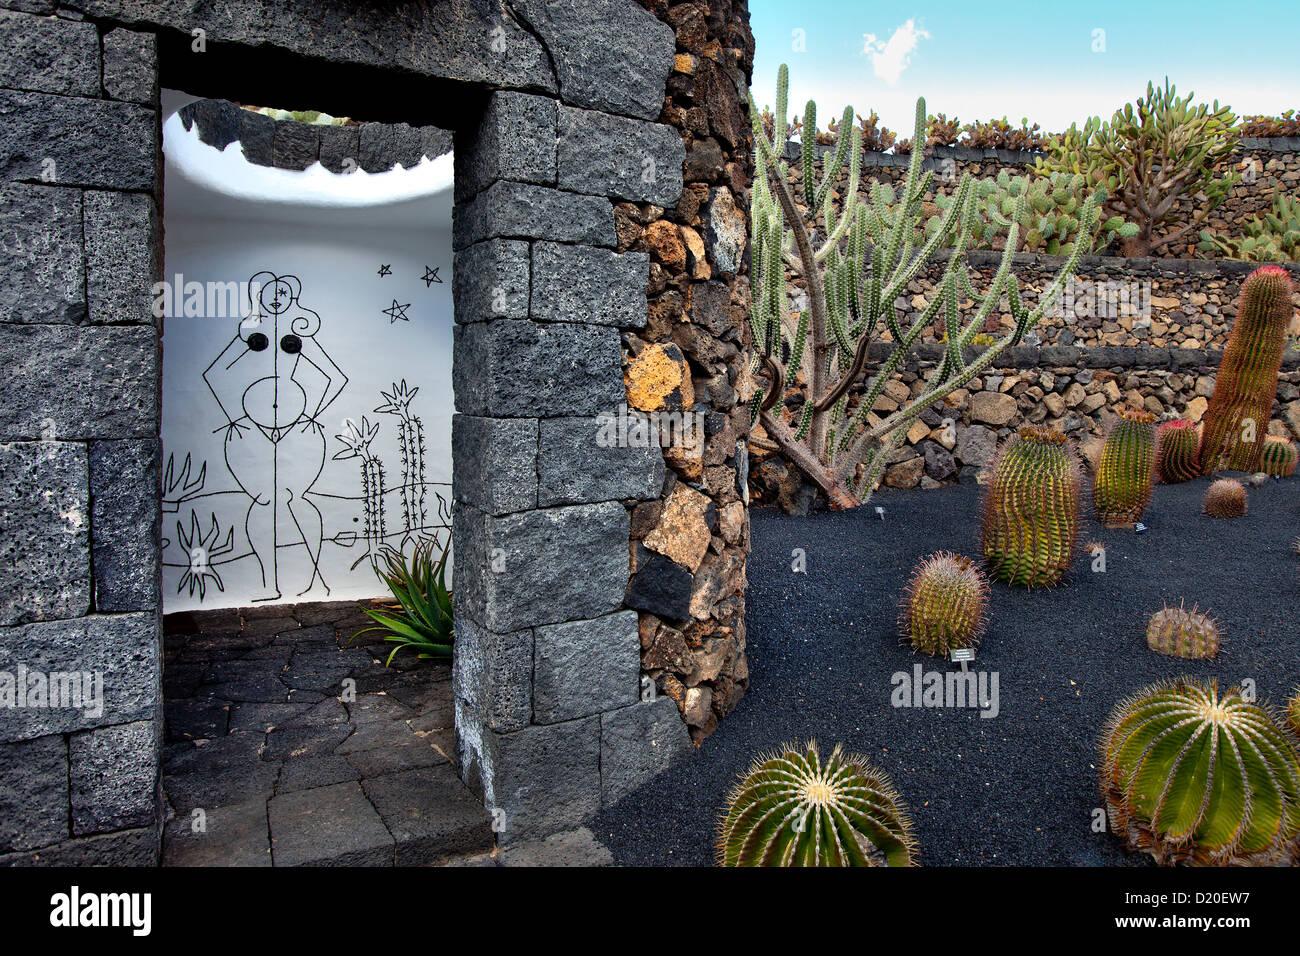 Damentoilette im Botanischen Garten Jardin de Cactus, Architekt, Casar Manrique, Guatiza, Lanzarote, Kanarische Stockbild